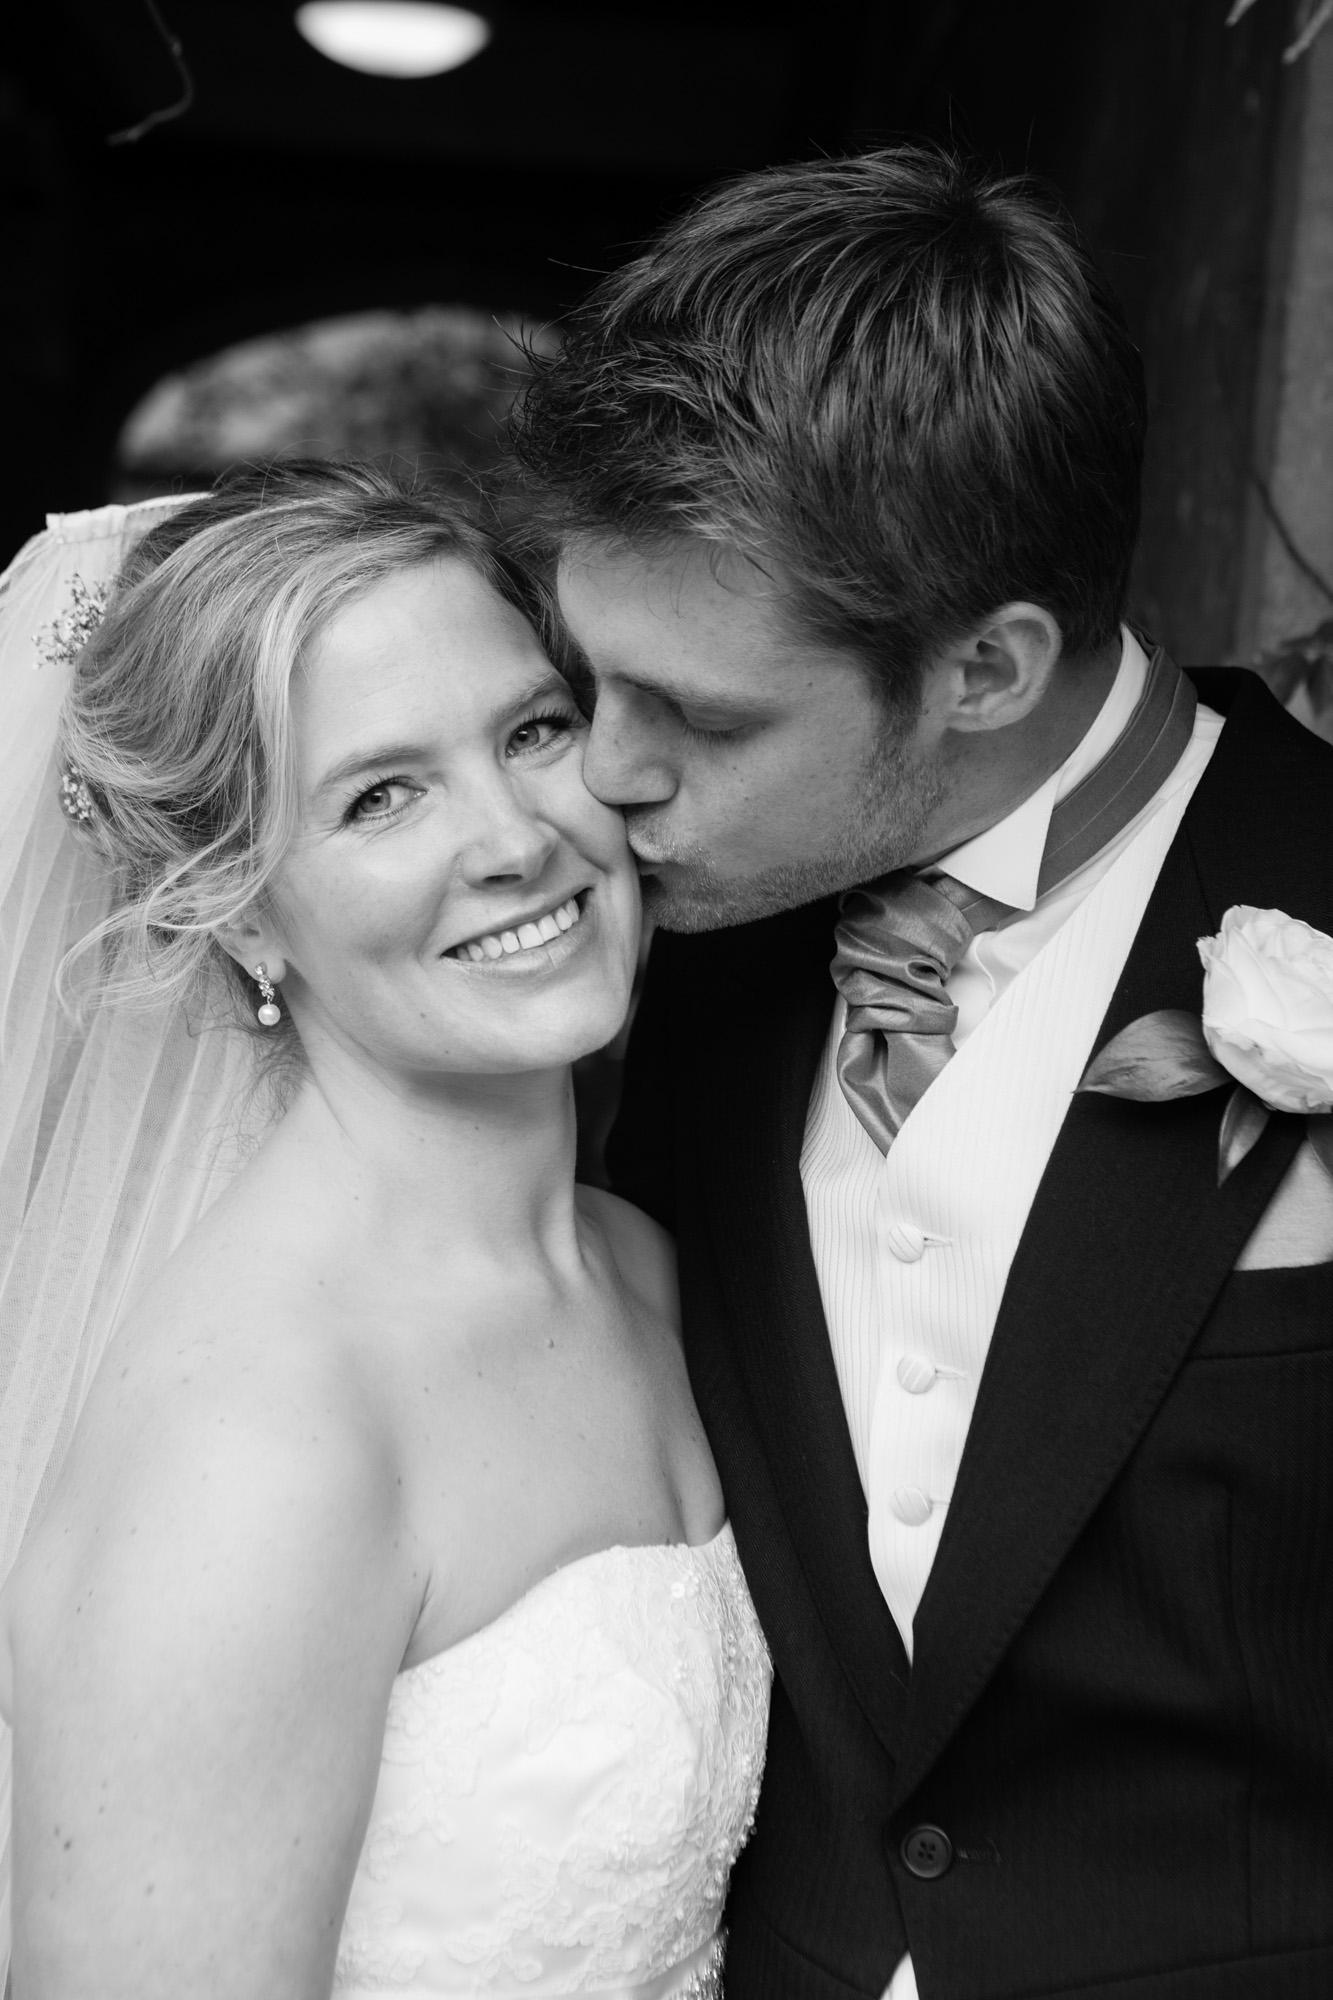 weddings-couples-love-photographer-oxford-london-jonathan-self-photography-69.jpg